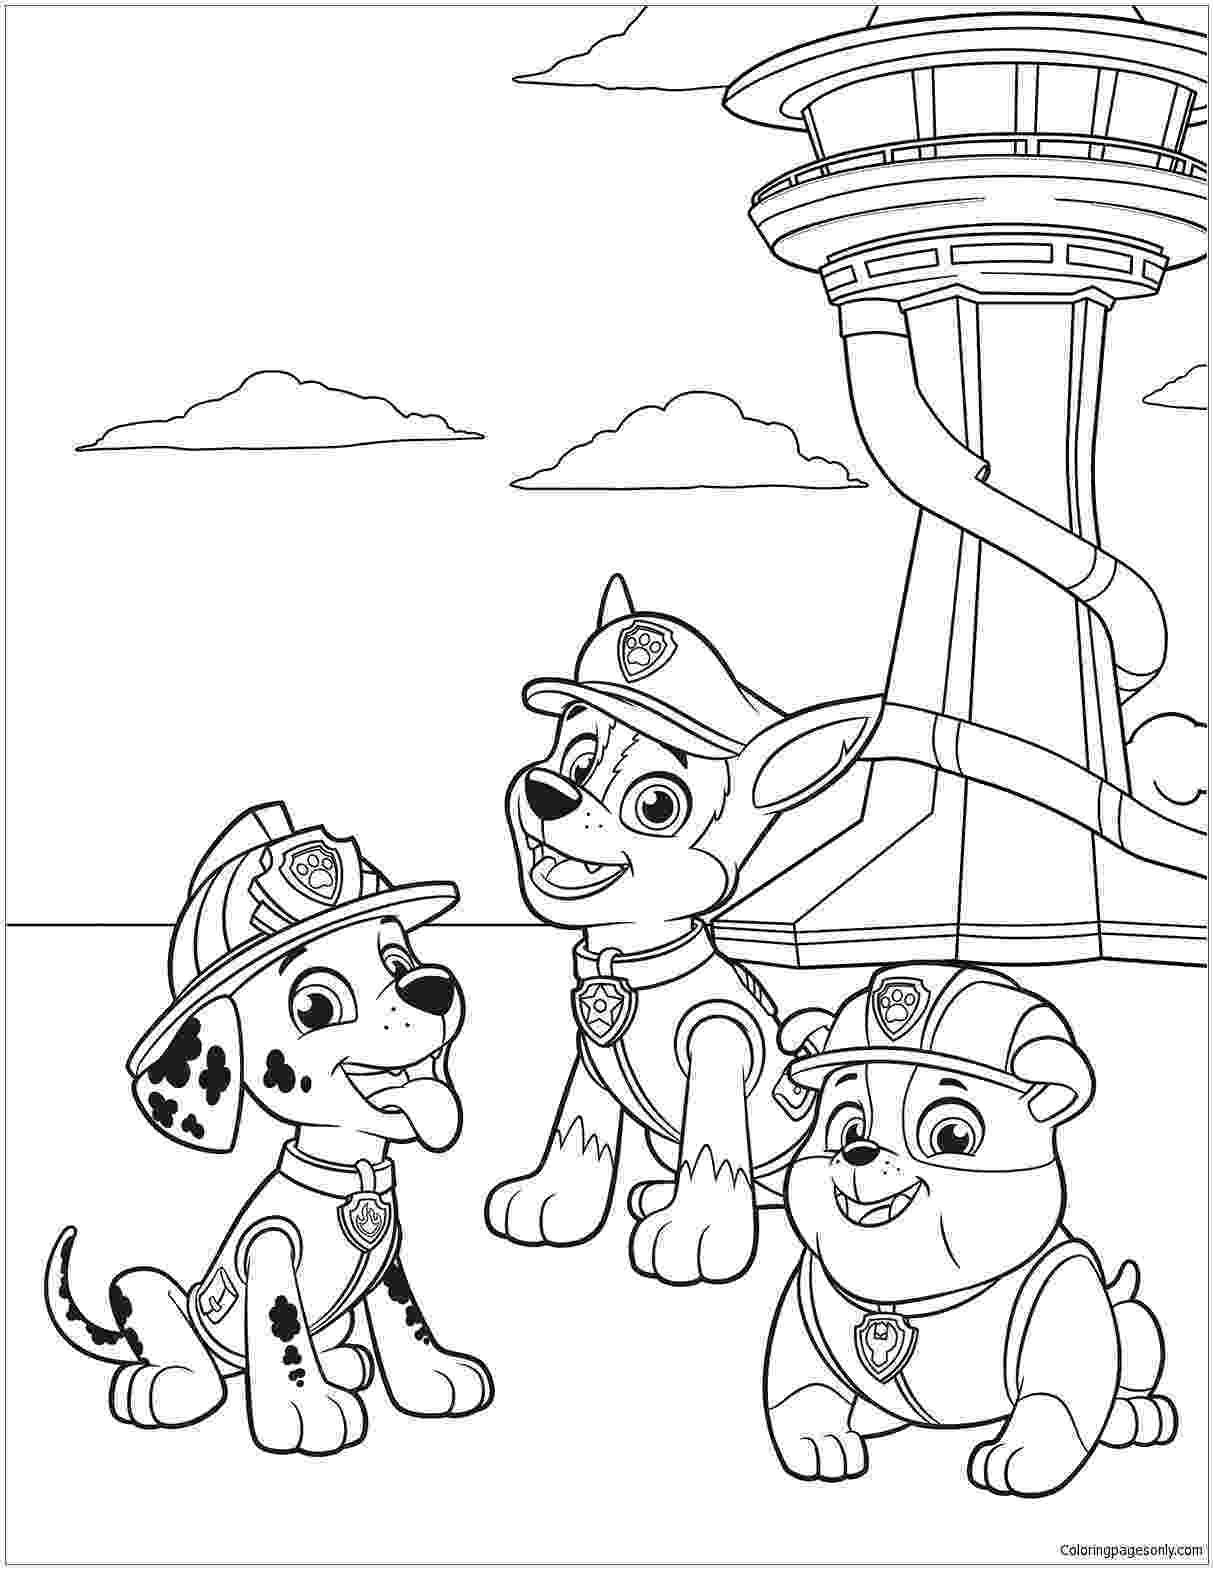 paw patrol coloring paw patrol coloring page coloring home coloring patrol paw